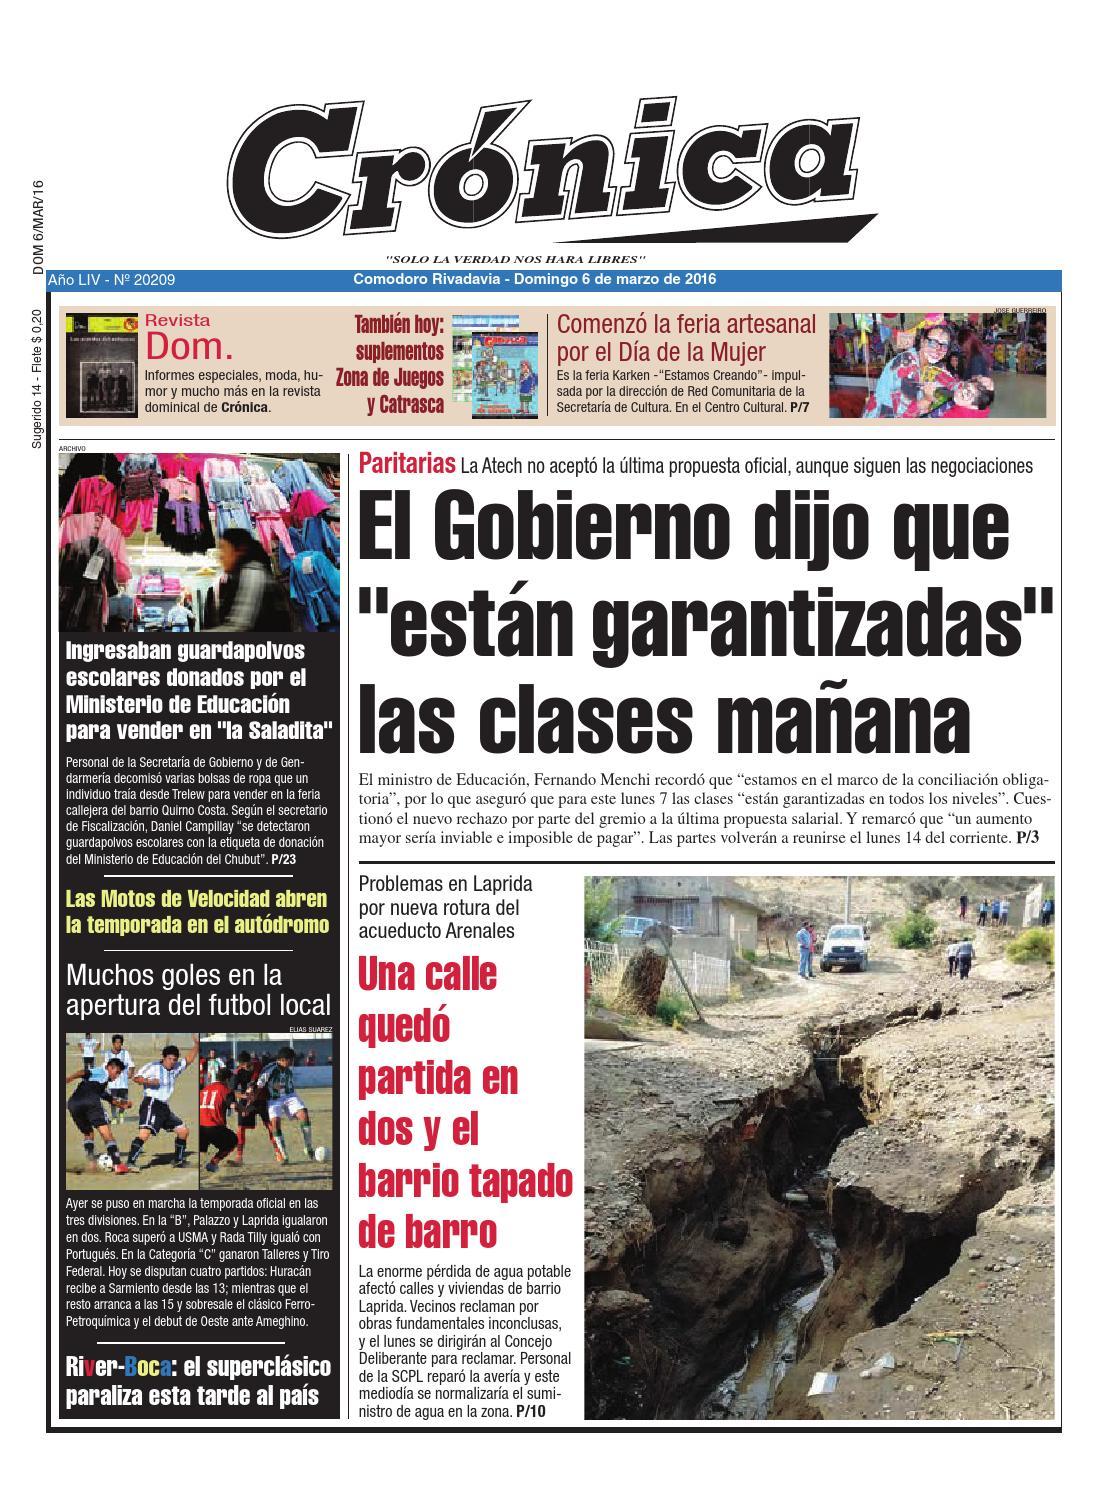 d1799d9b5986f 1161212303c20910bc33e19f7008e04f by Diario Crónica - issuu